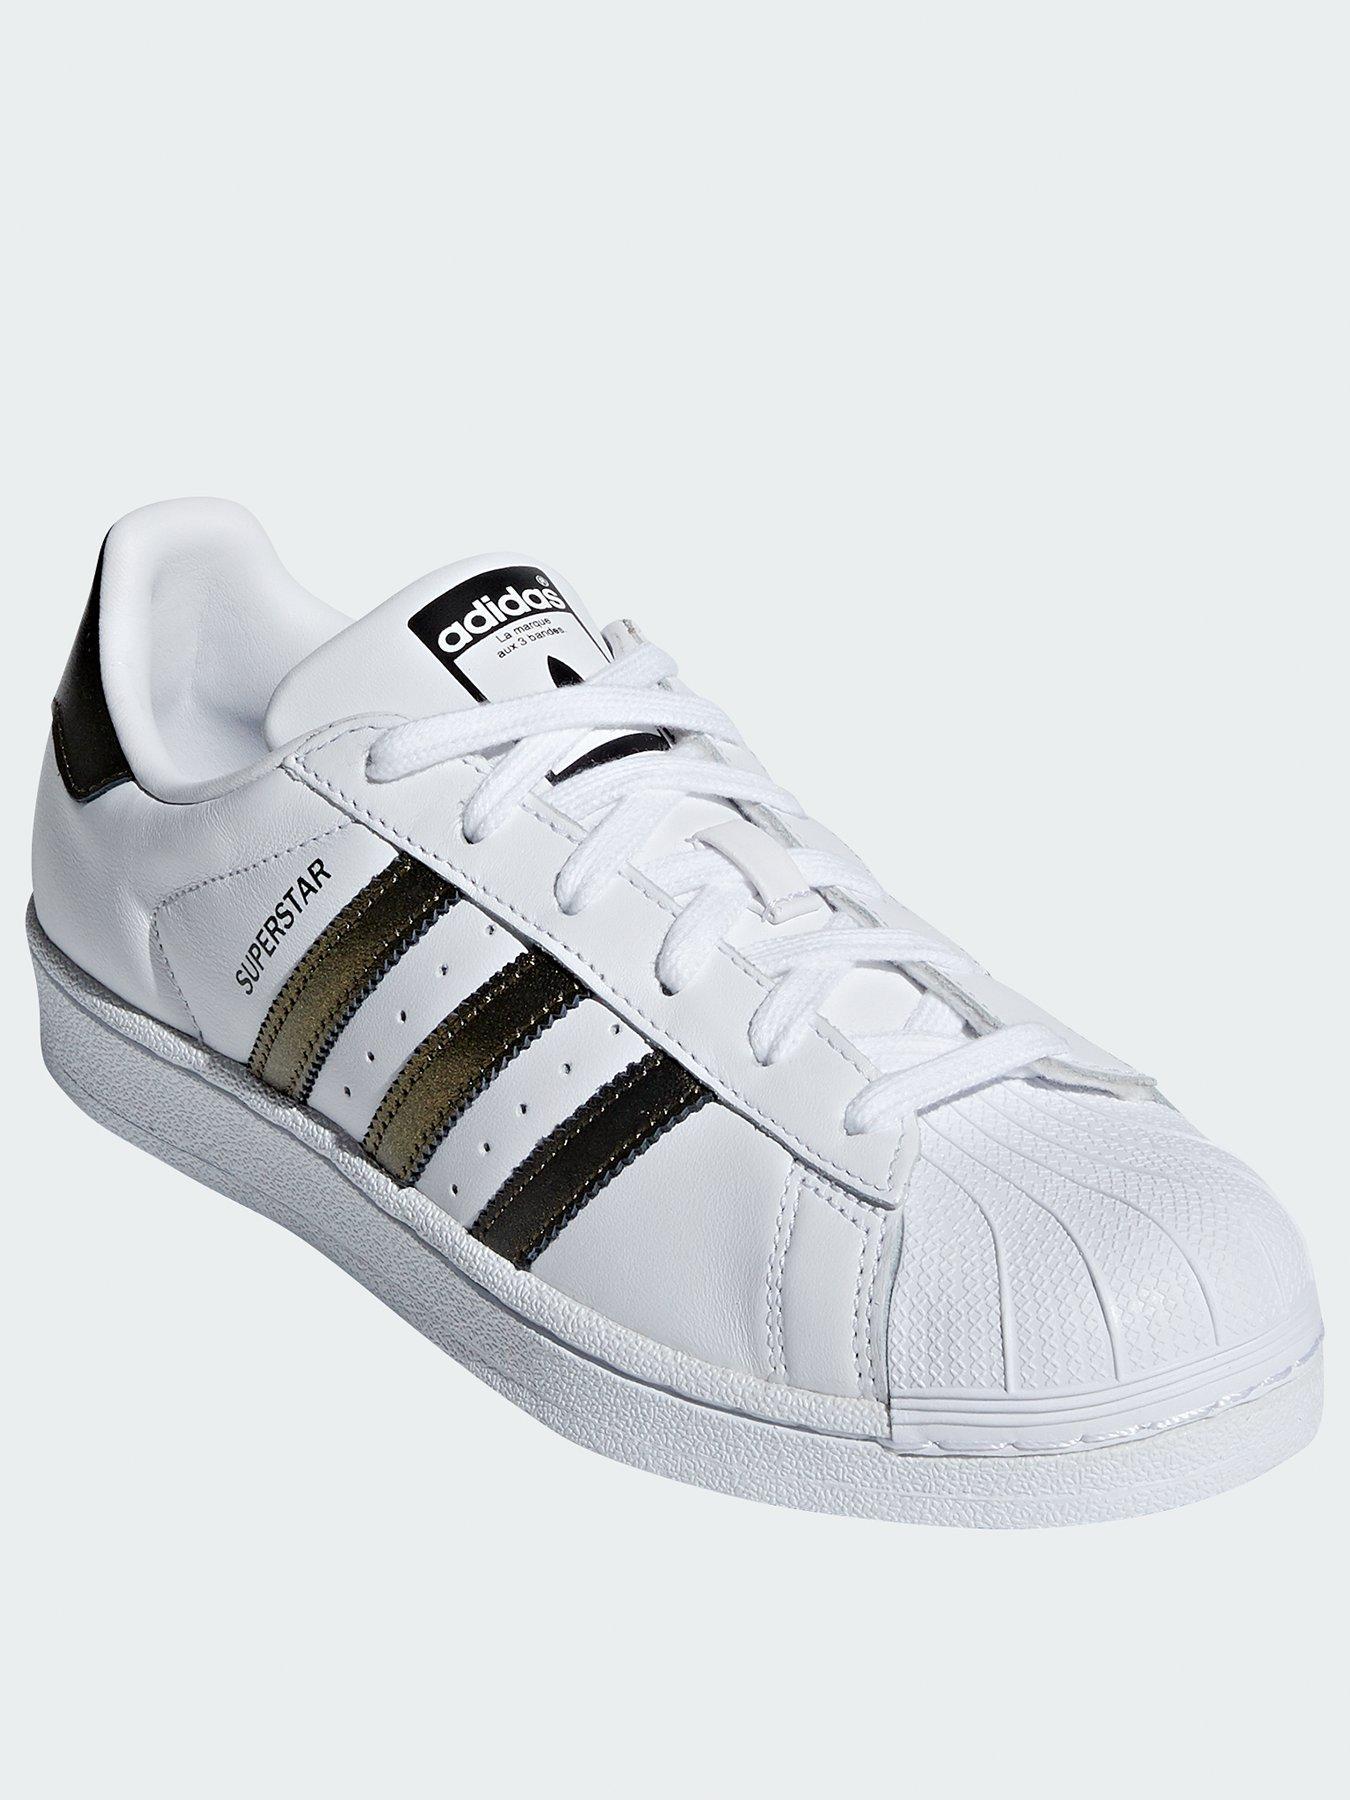 0d868f790f4dad germany superstar shoes e590f 6d582  shopping adidas originals superstar  white black 4bdb4 f7592